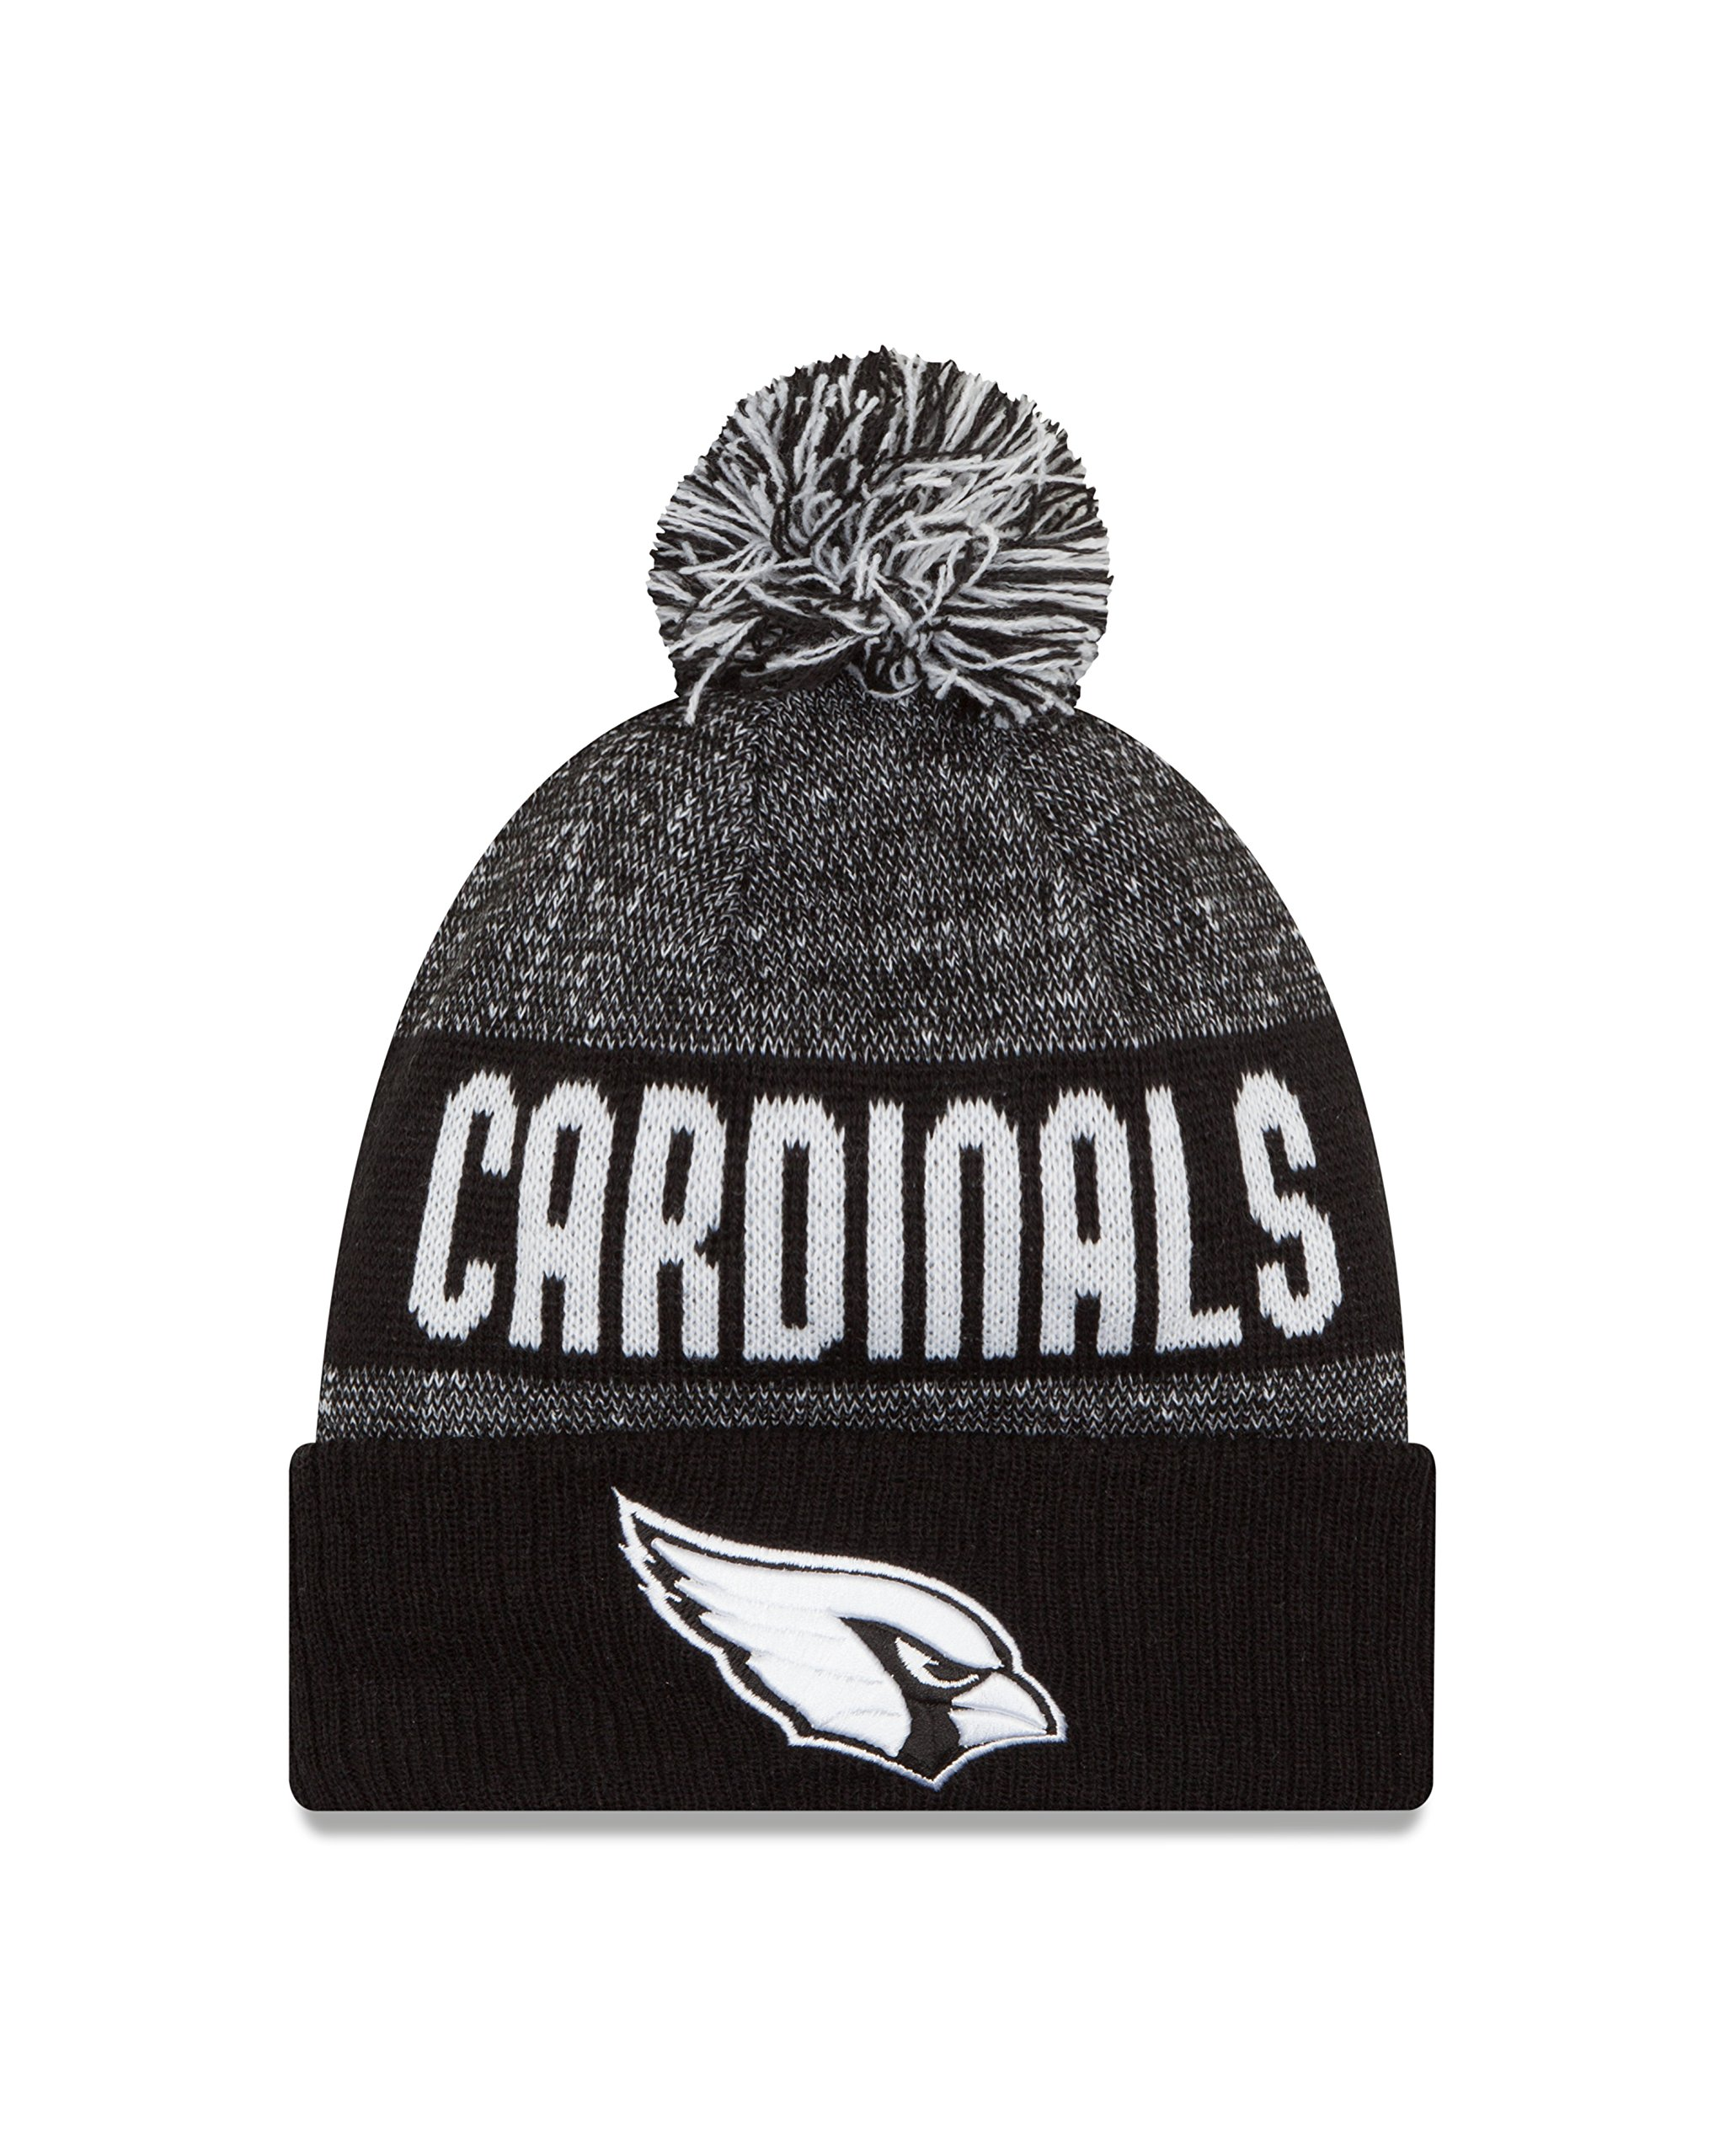 New Era NFL Arizona Cardinals 2016 Sport Knit Beanie, One Size, Black/White